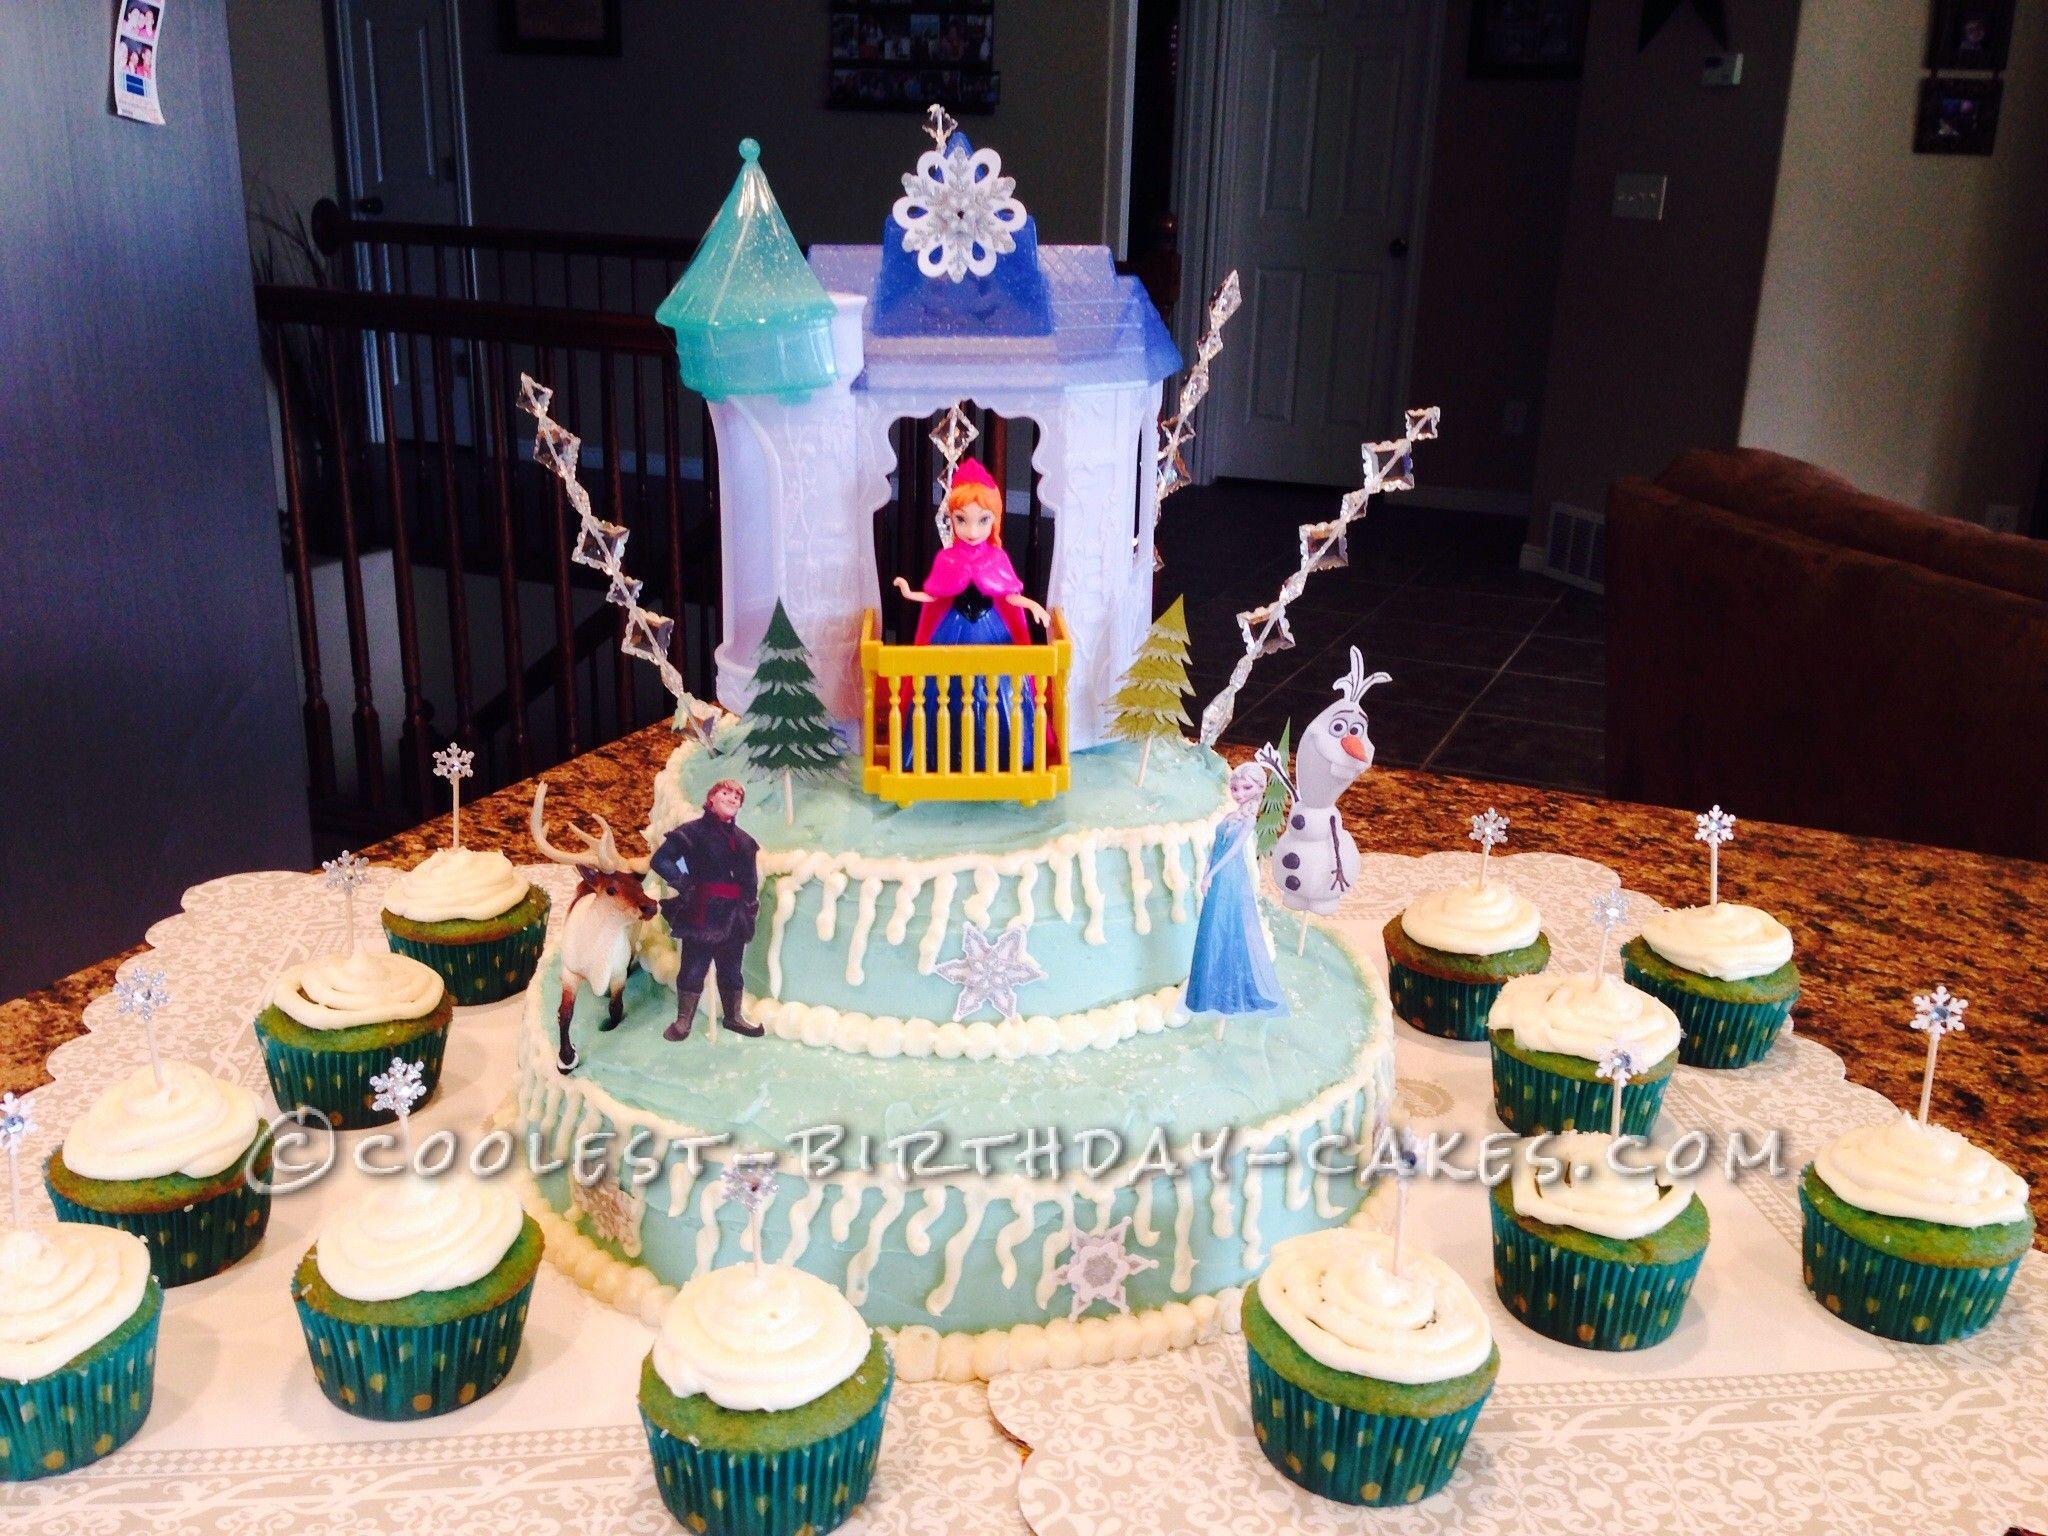 Cool Homemade Disney Frozen Birthday Cake Disney frozen birthday